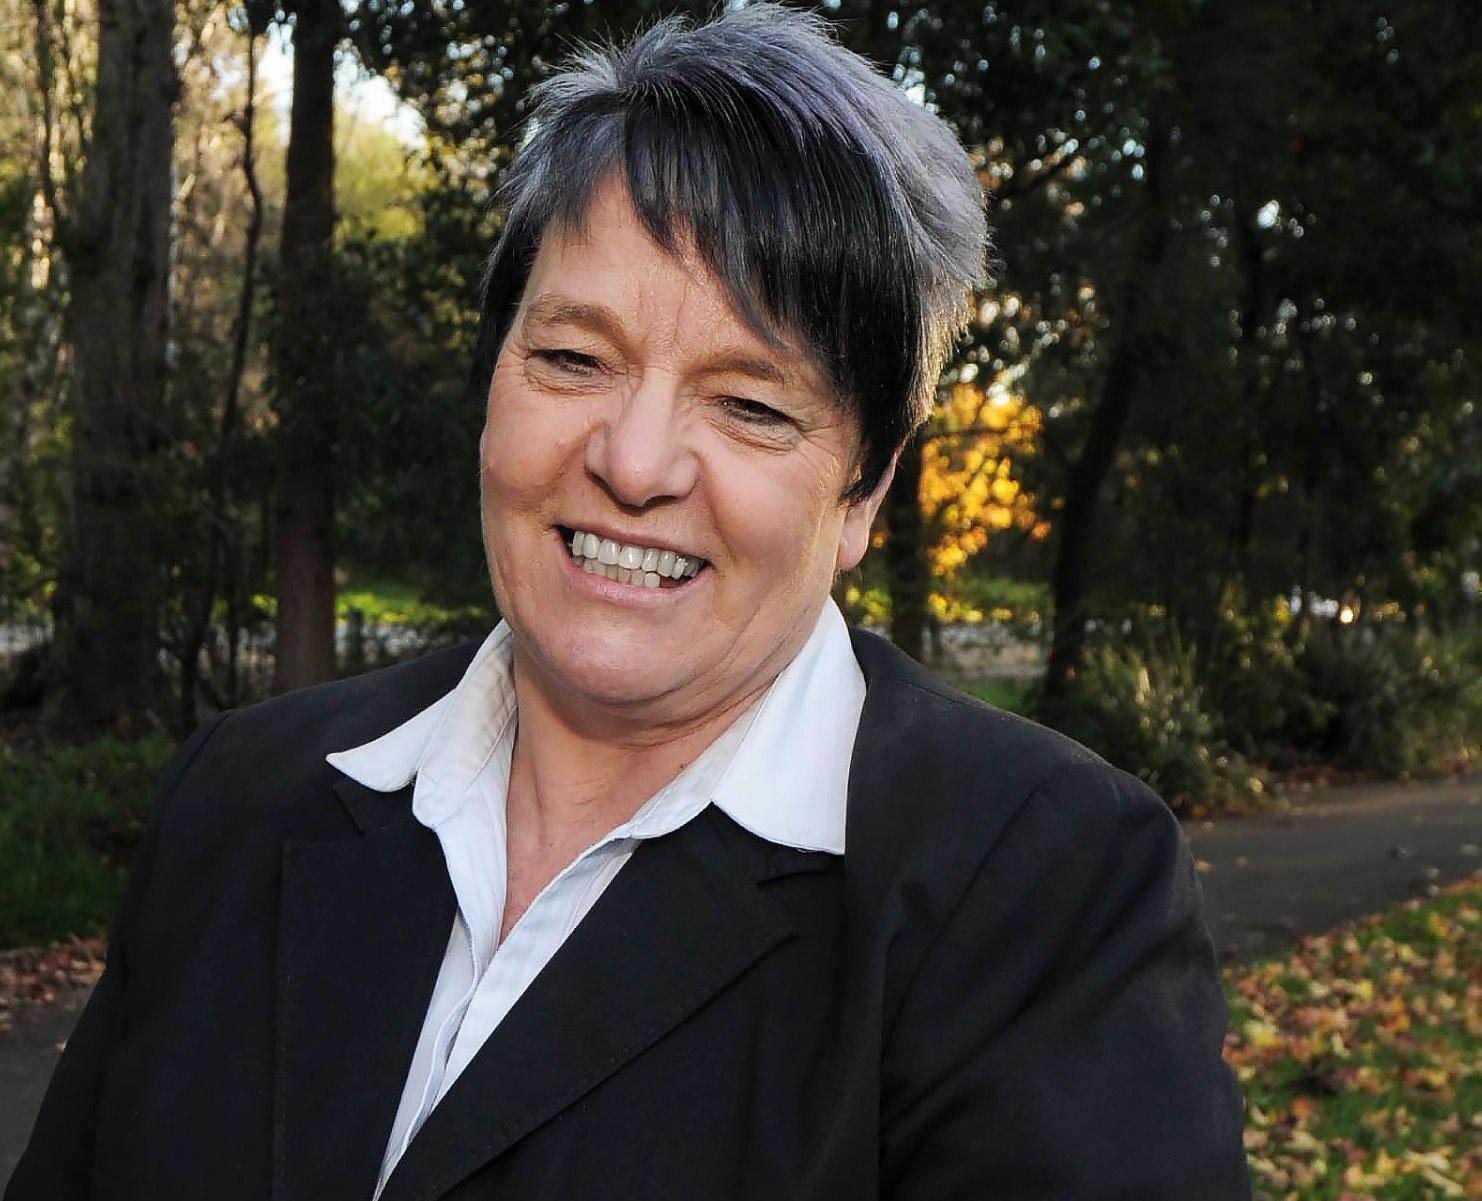 Jane Nunn